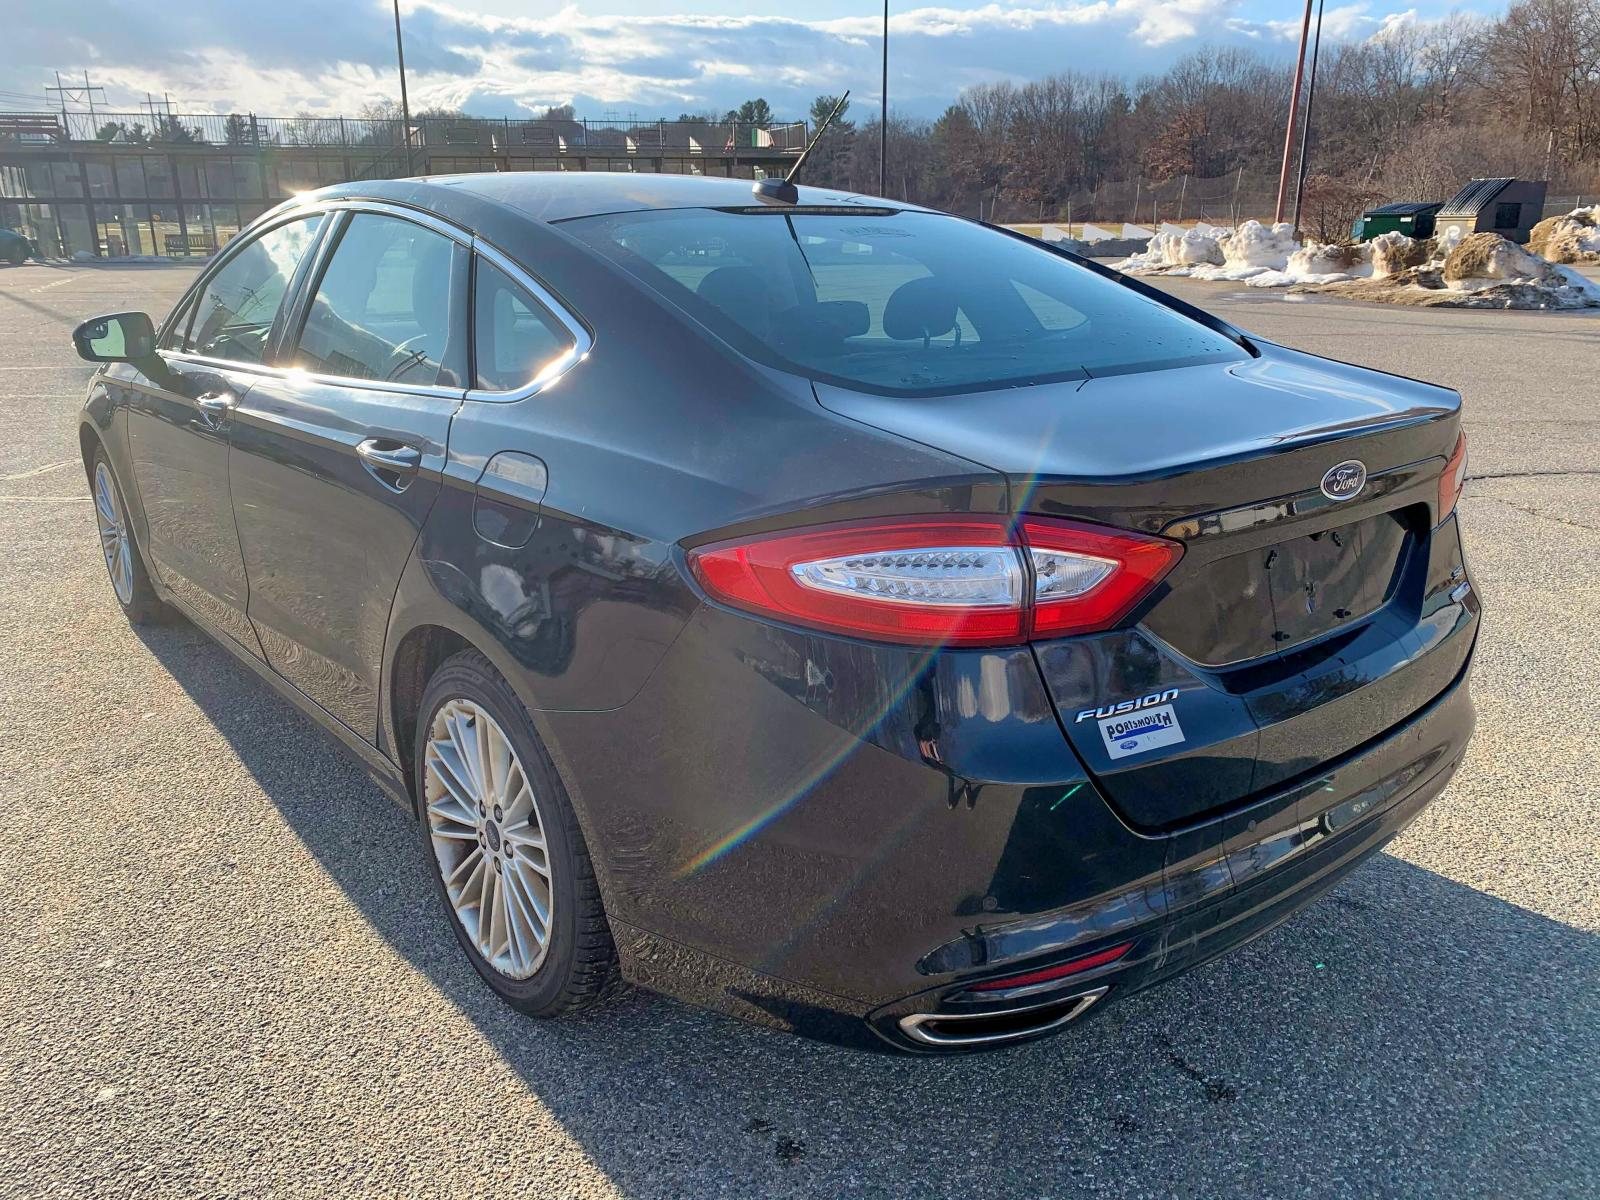 3FA6P0T9XGR107587 - 2016 Ford Fusion Se 2.0L [Angle] View